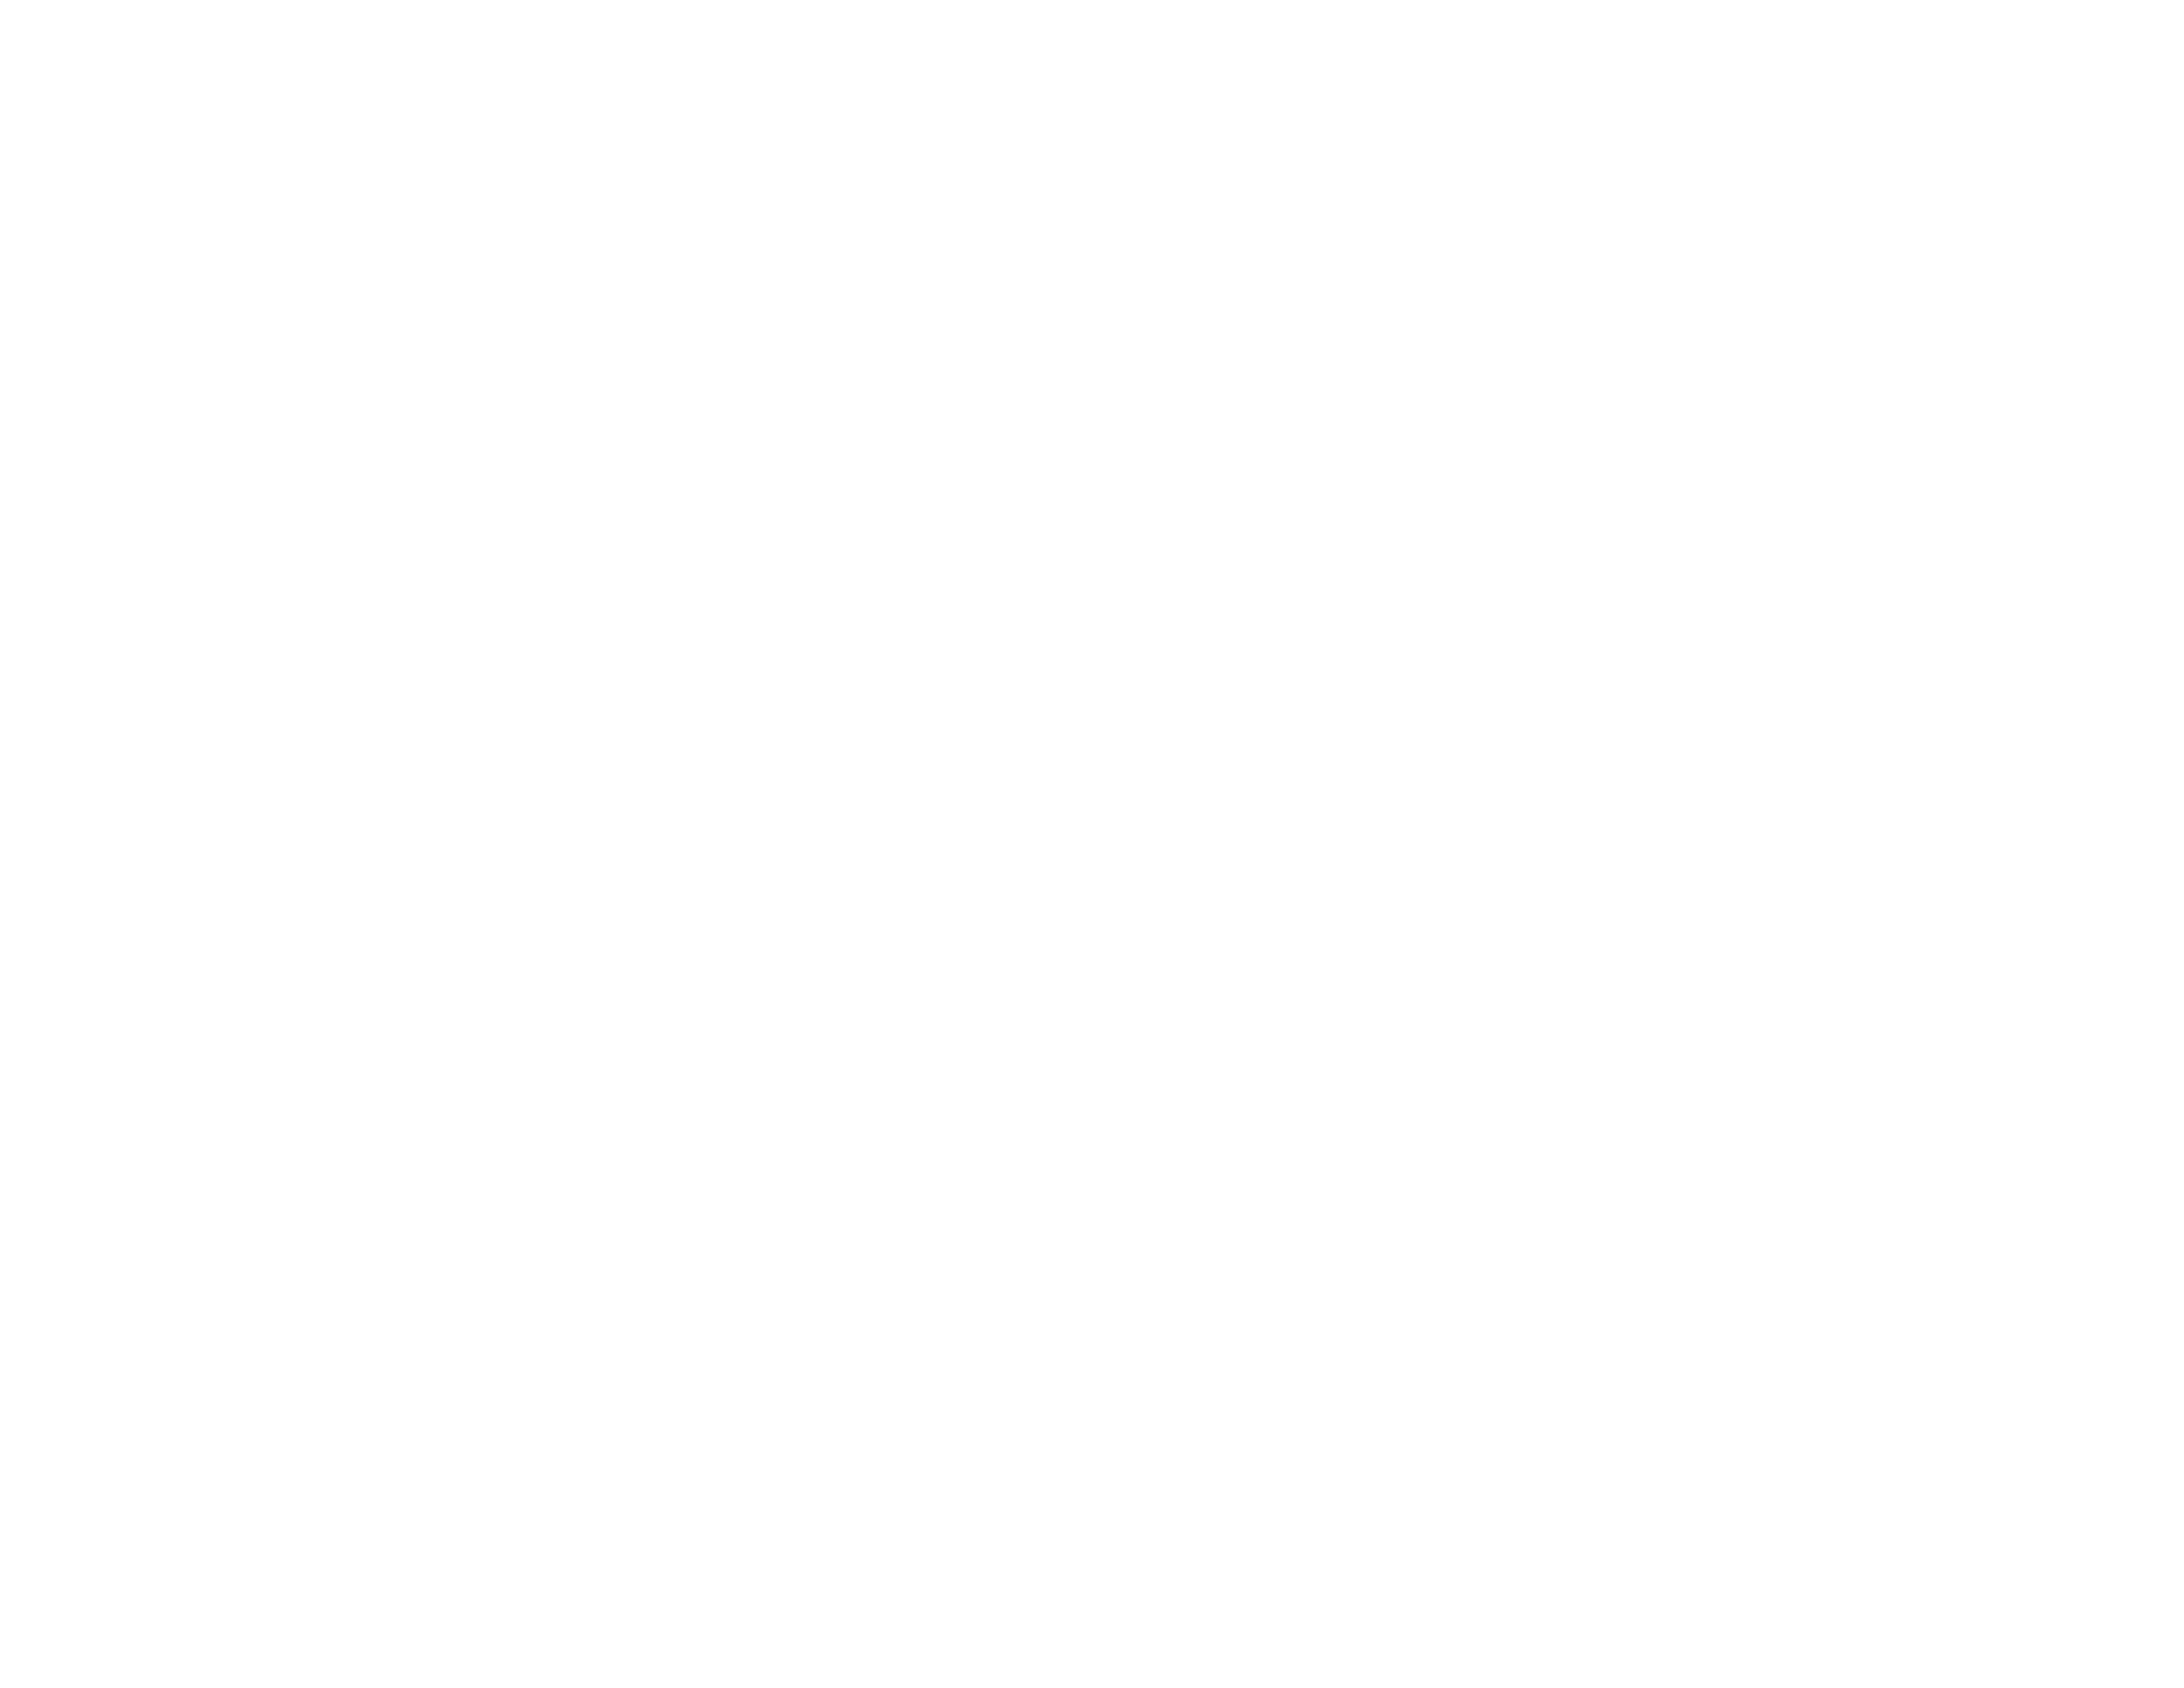 49th State, 49th State Brewing, 49th State Brewery, 49th State Brewing Co, 49th State Brewing Company, Denali, Denali Park, Denali National Park, DNP, Denali brewery, Denali brewpub, Denali restaurant, Alaska restaurant, Alaska brewery, prospectors, prospectors pizzeria, pizza